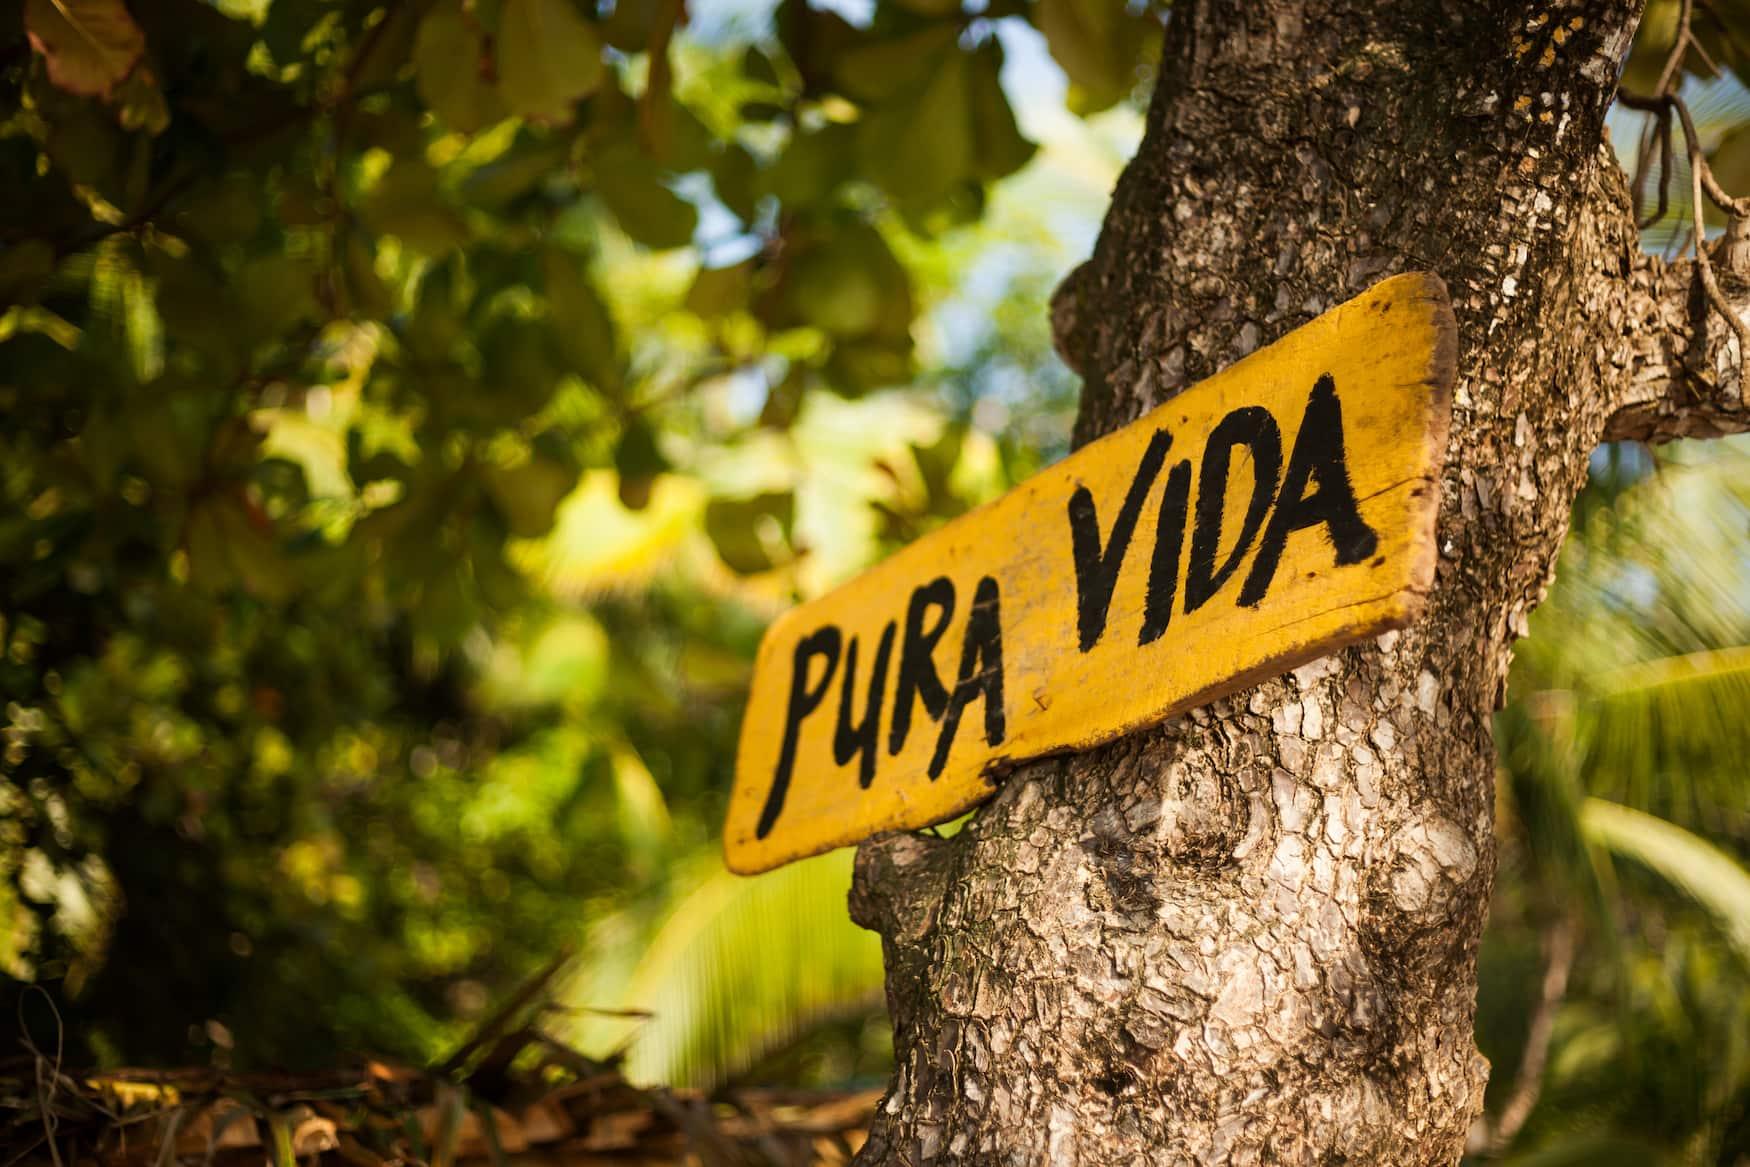 Andere Länder, andere Sitten: In Costa Rica ist alles Pura Vida